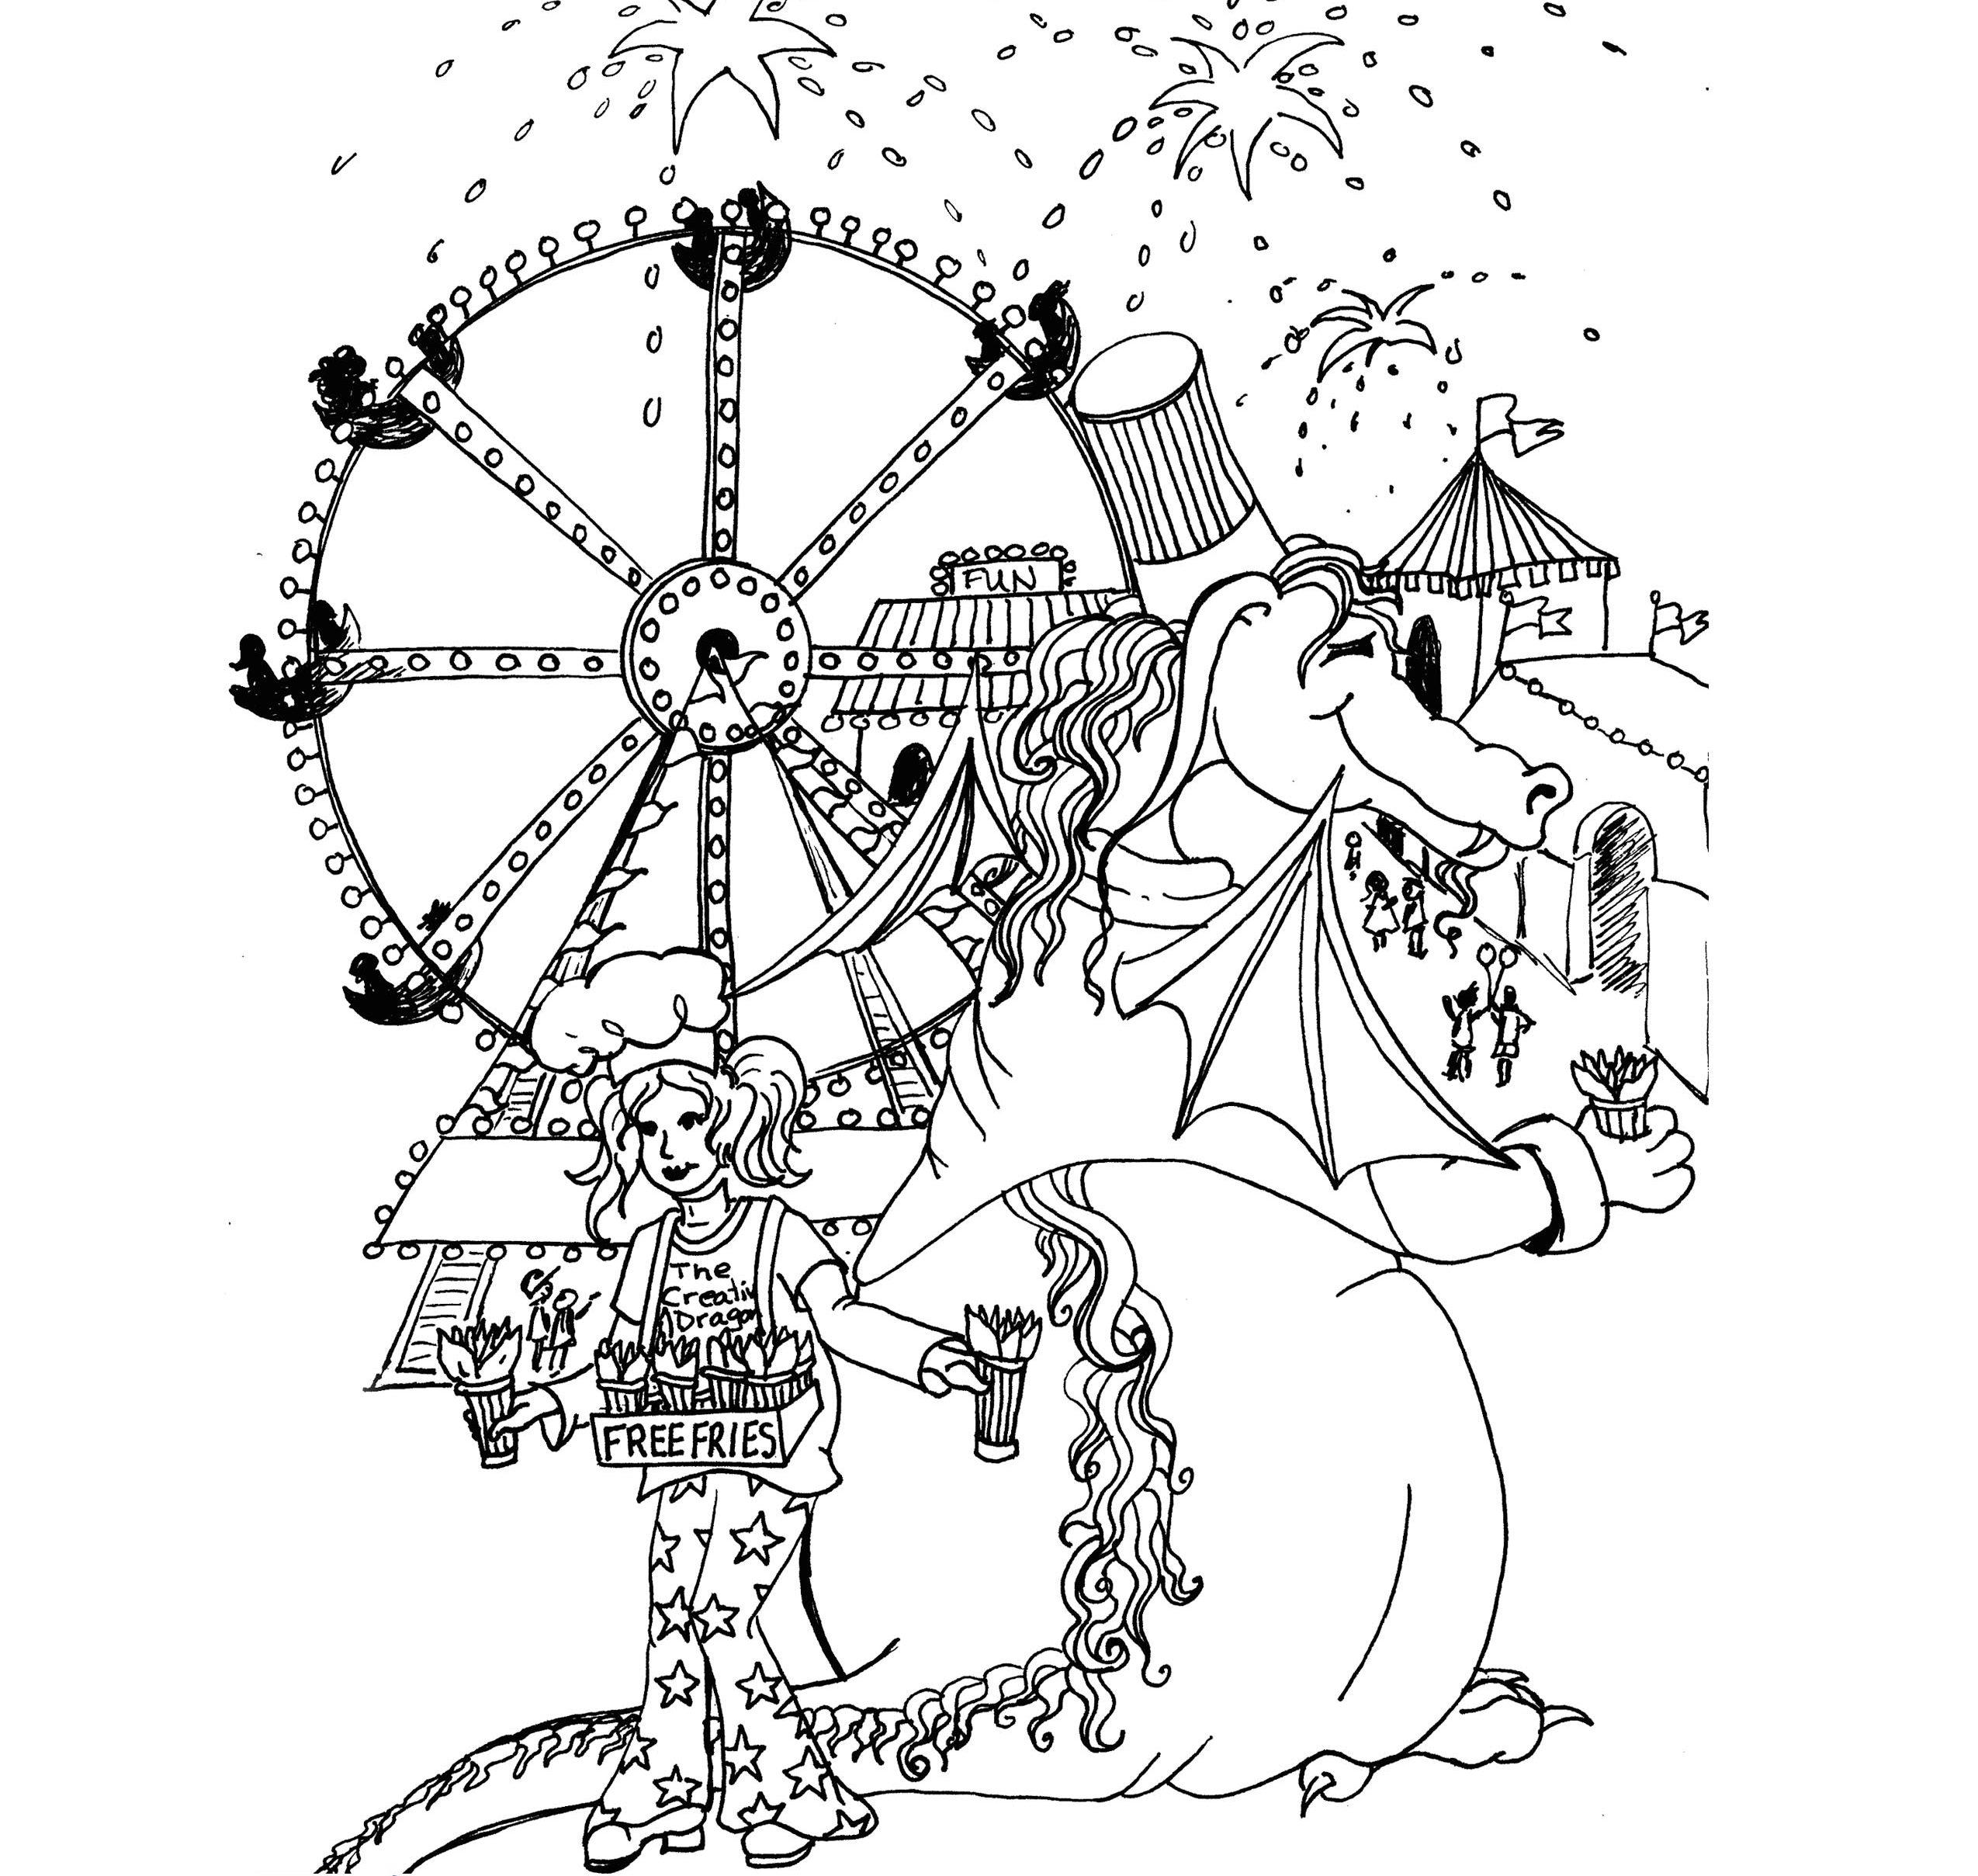 One Potato Coloring Page Princess Rain And The Dragon